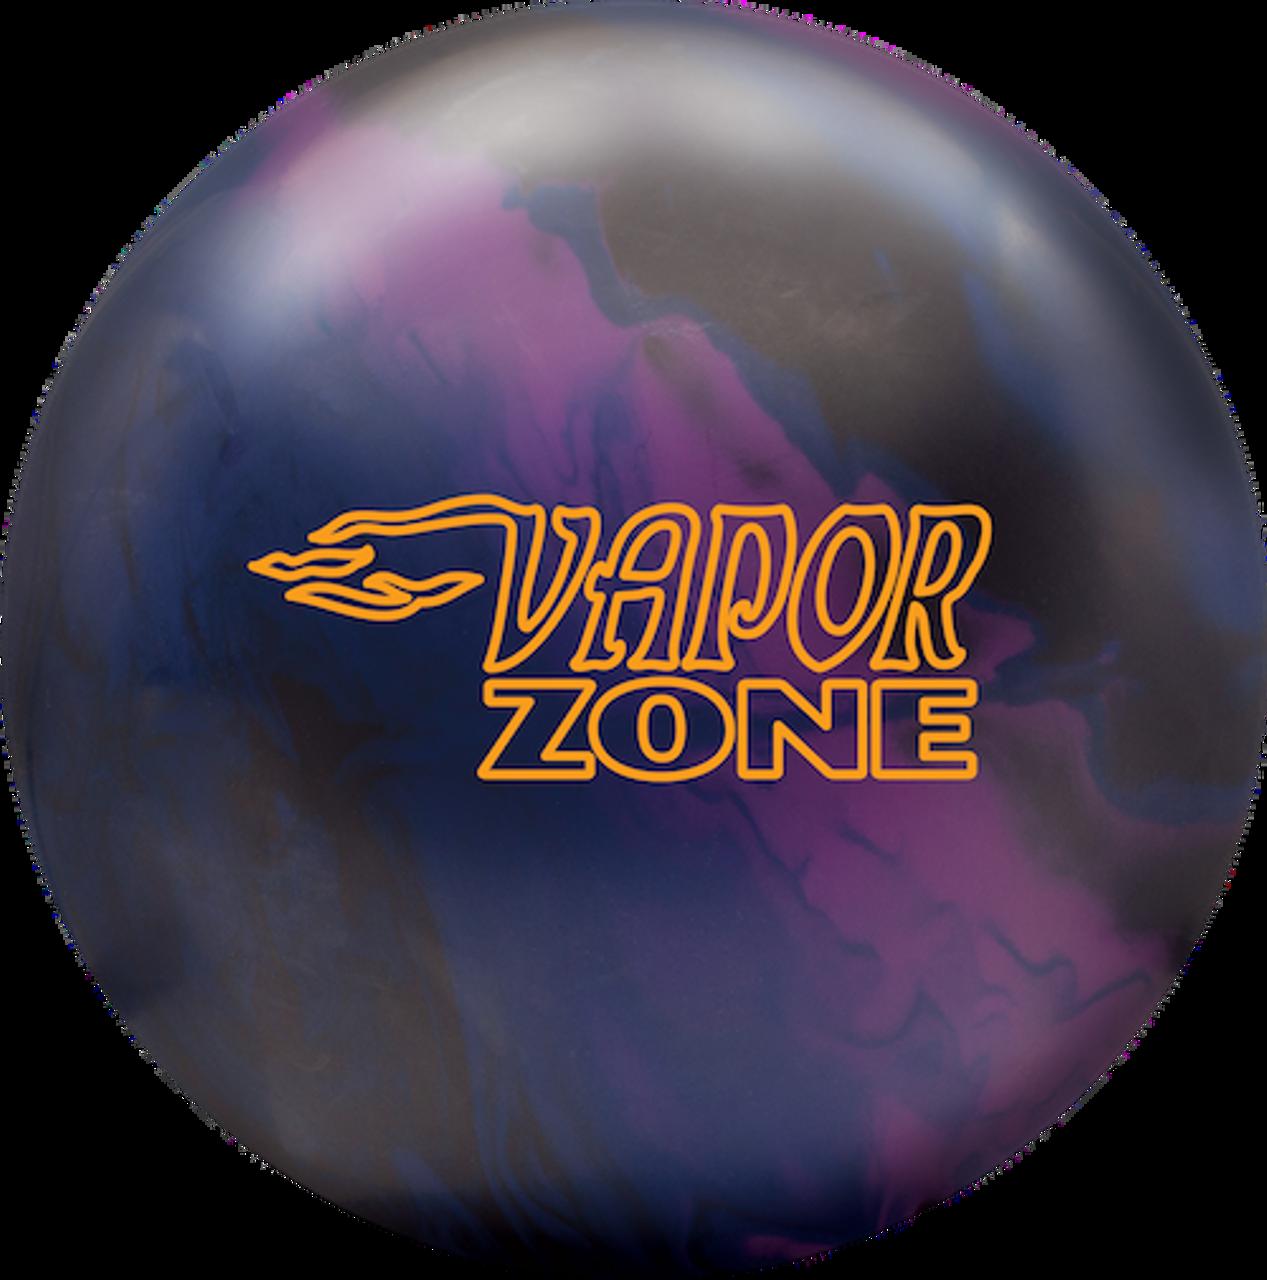 Brunswick Vapor Zone Solid Bowling Ball